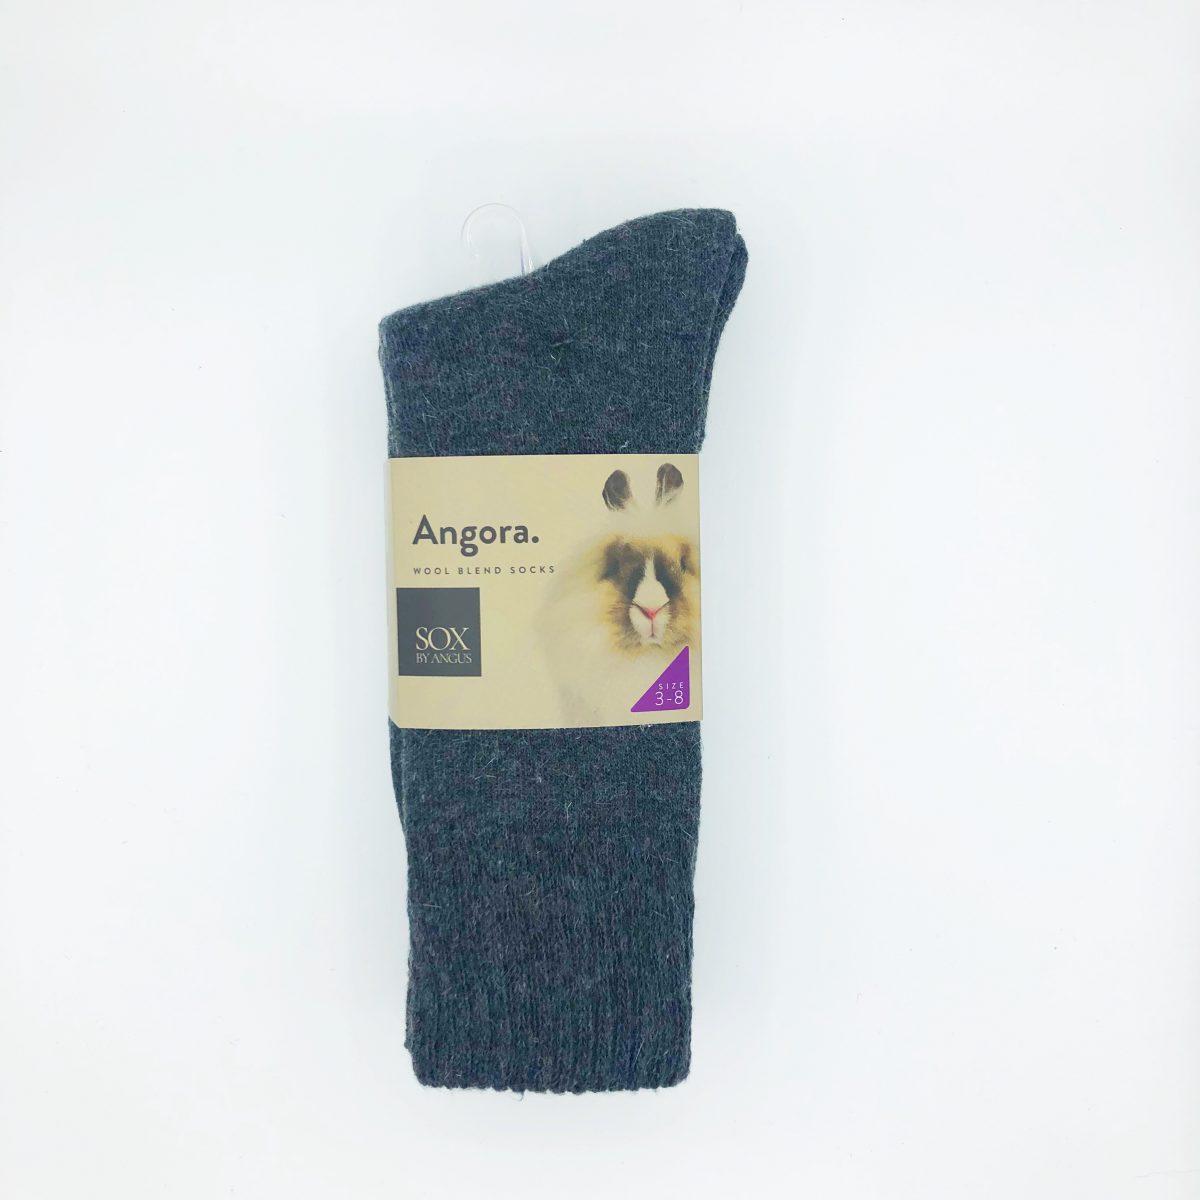 Angora Wool Blend Socks 2 Pair Pack - Charcoal